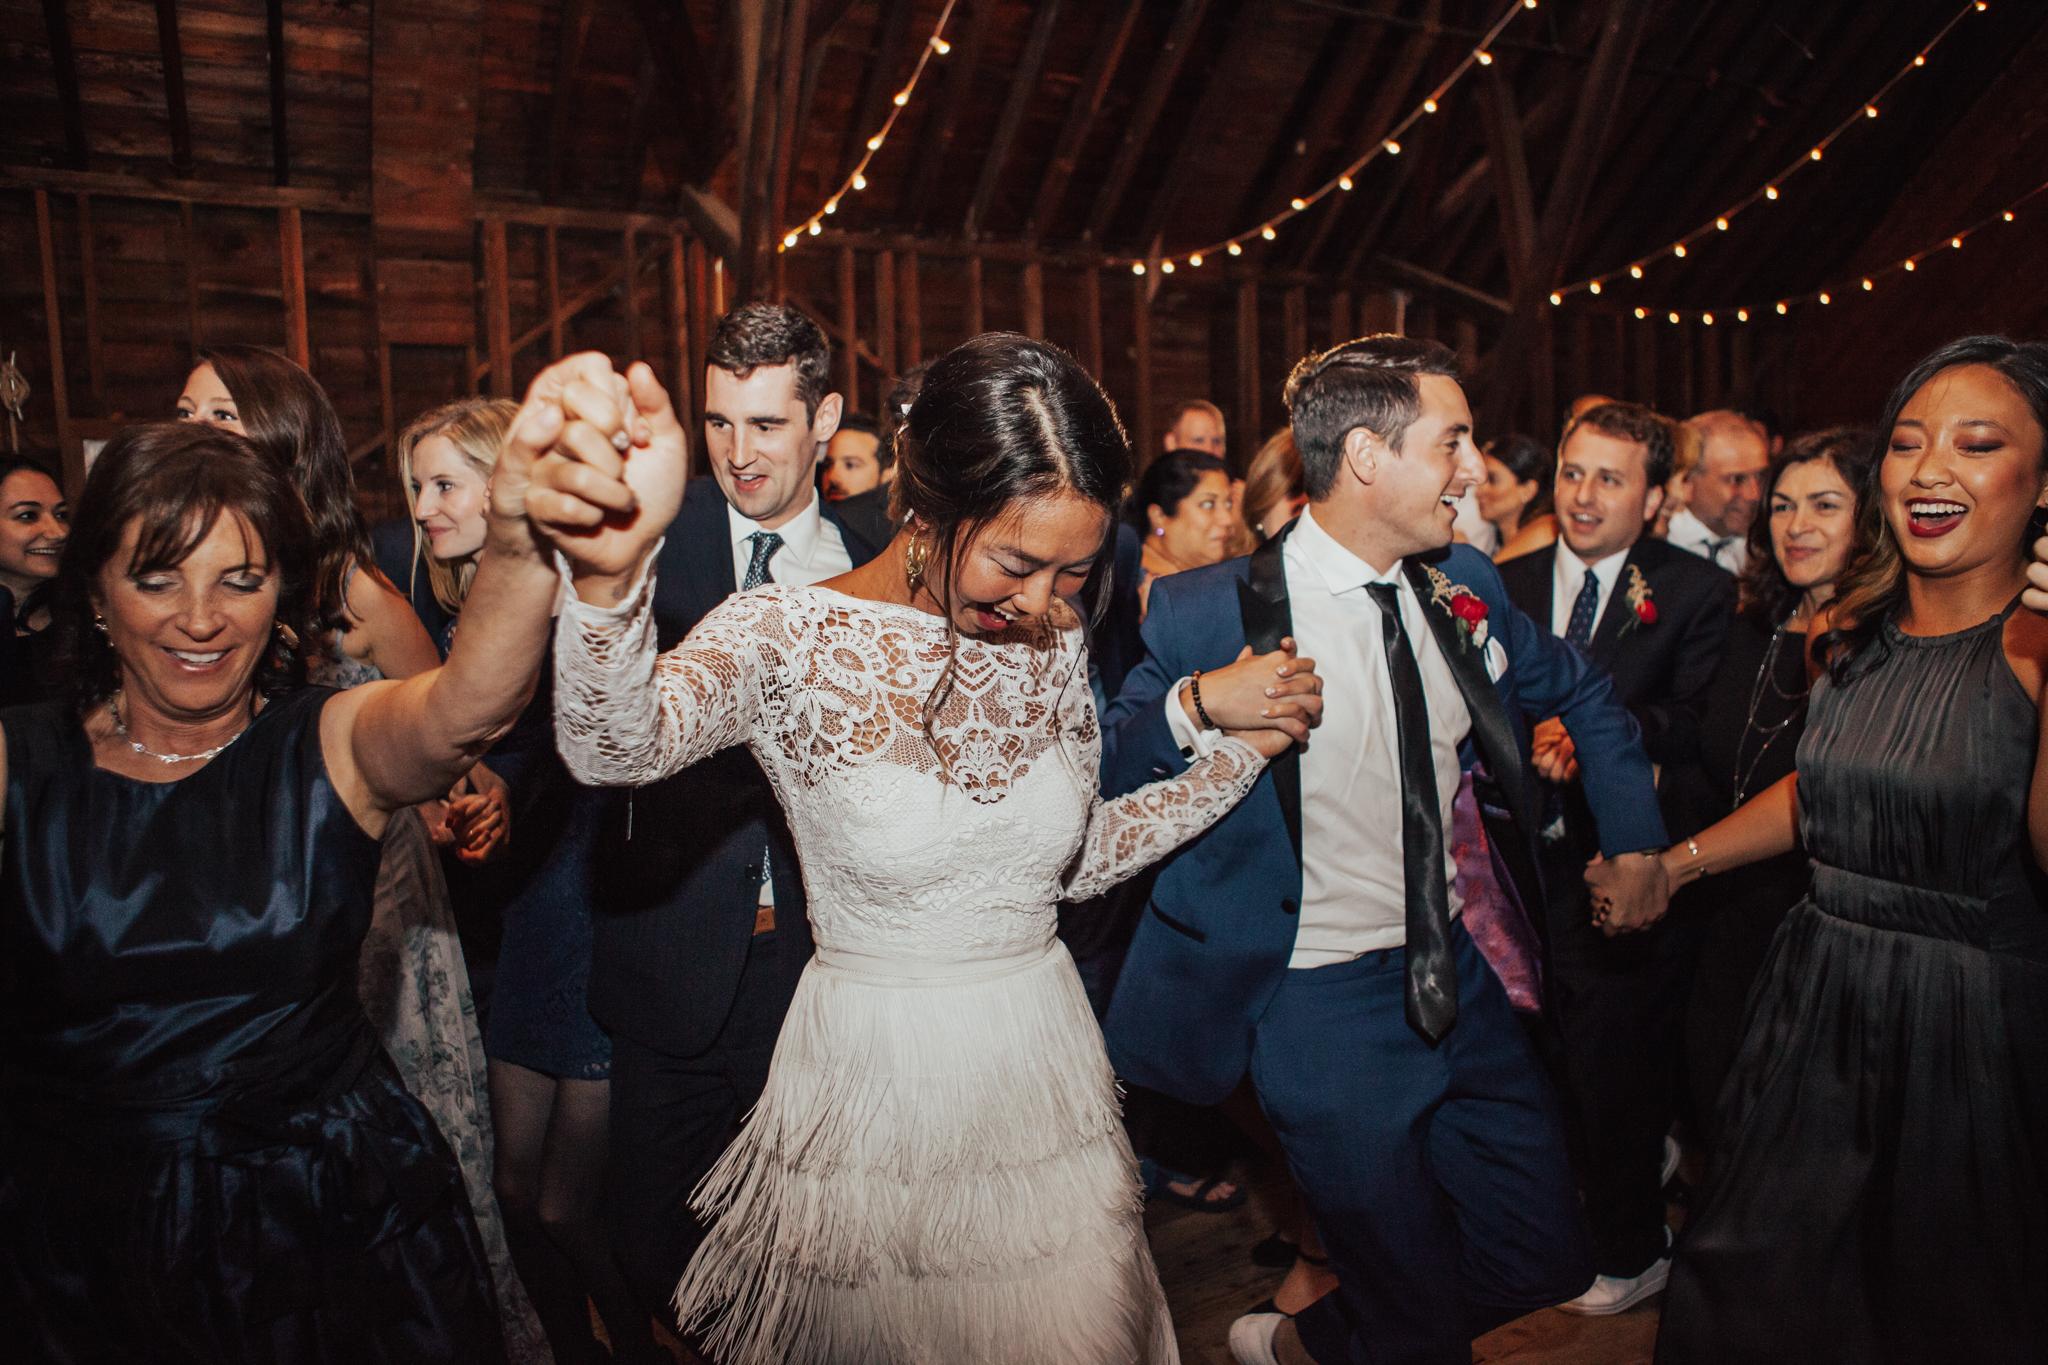 dancing photos wedding nyc